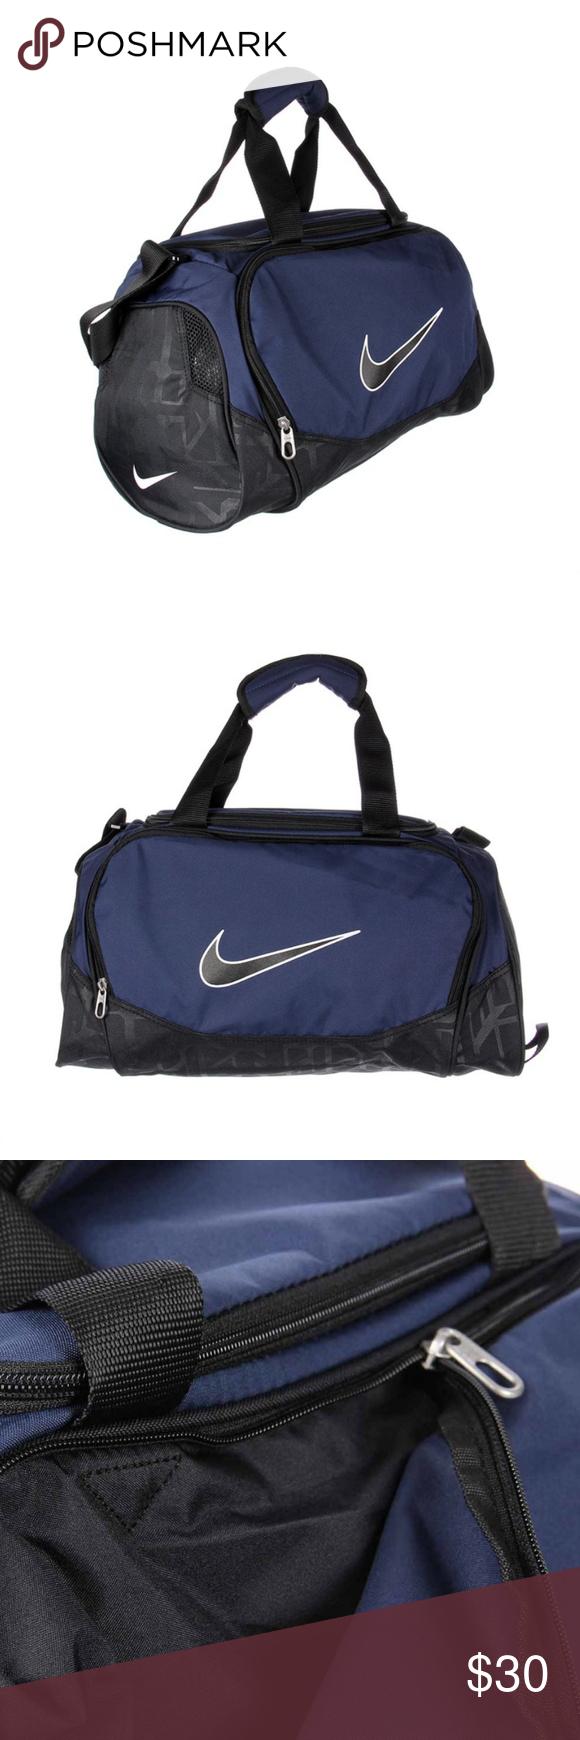 Nike BRASILIA 5 X-SMALL Duffel Bag Navy White Blk Nike Brasilia 5 X ... 2c0aed2bb3069